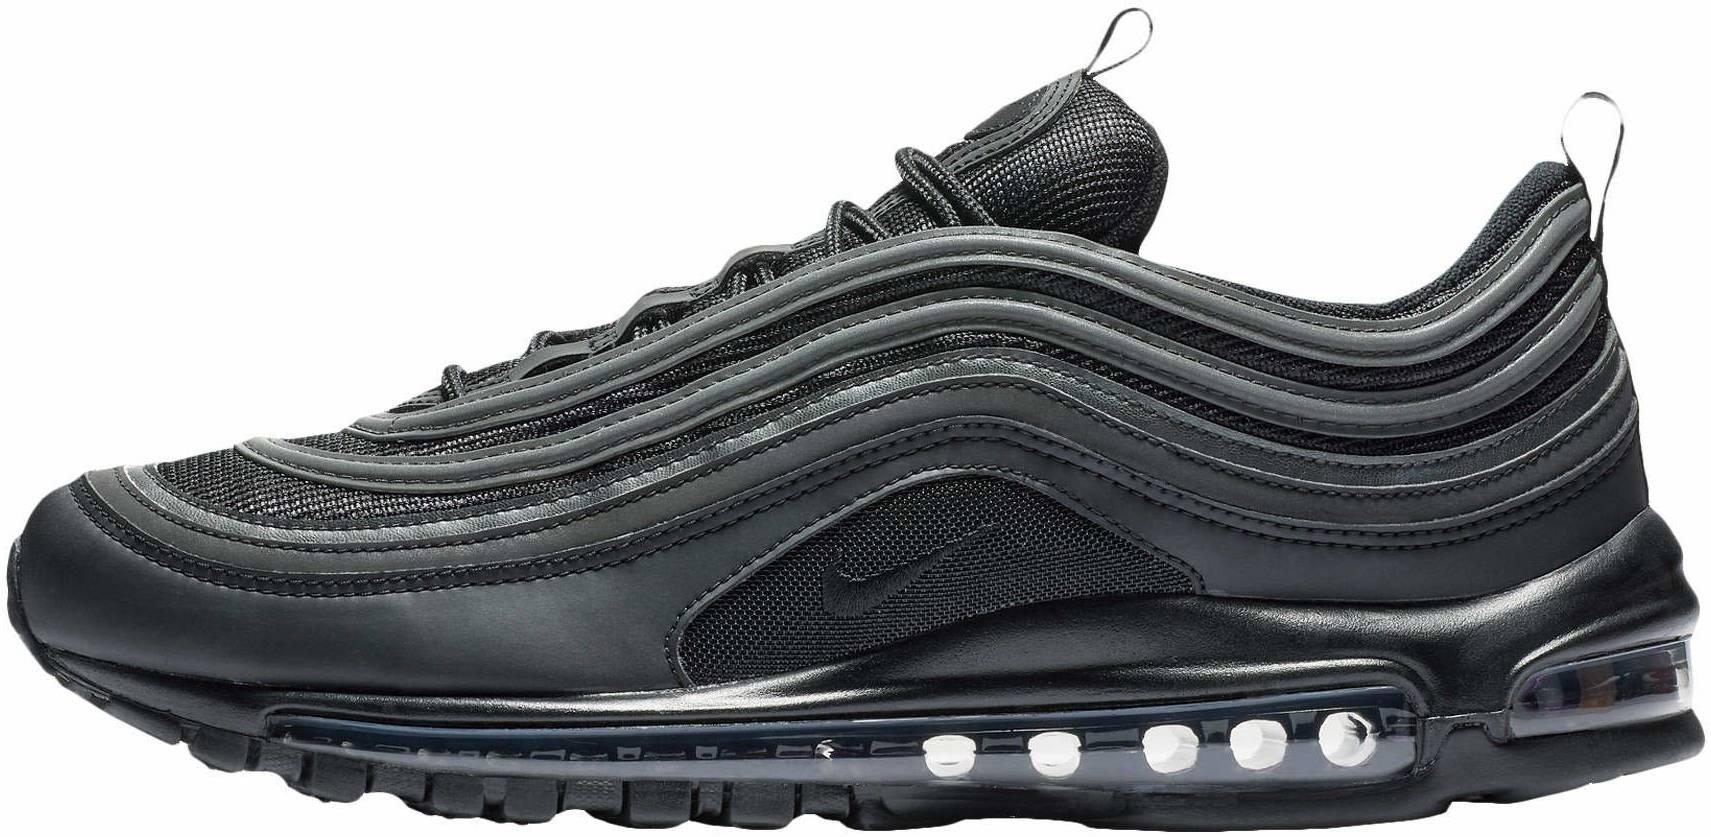 Nike Air Max 97 sneakers in 10 colors (only $150) | RunRepeat